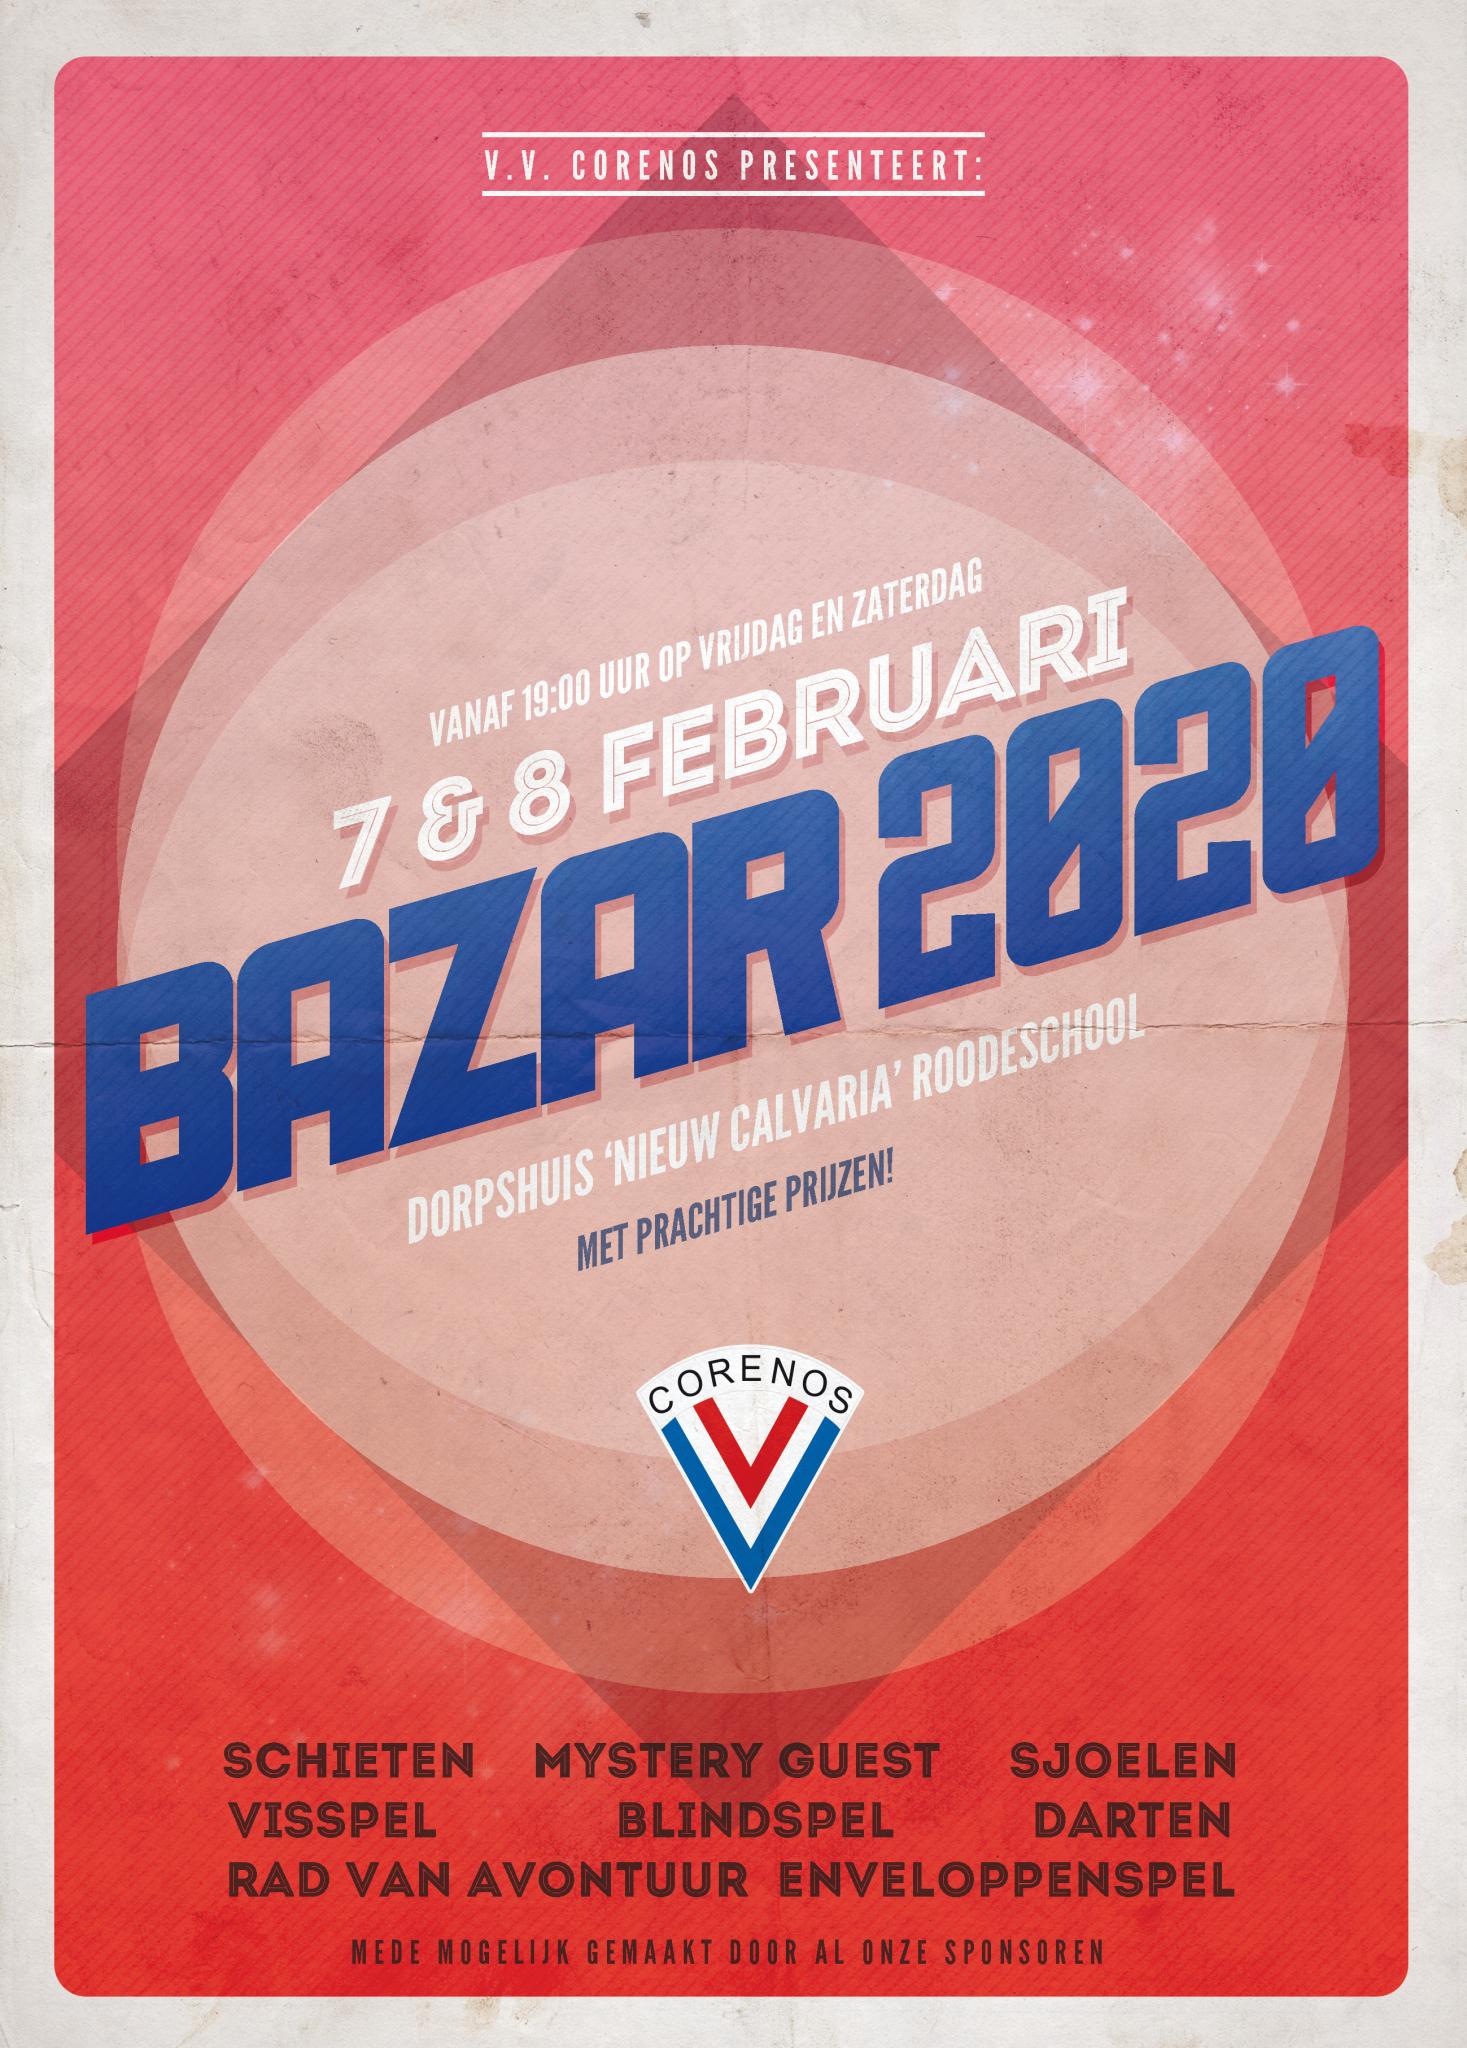 Bazar 2020 zeer succesvol!